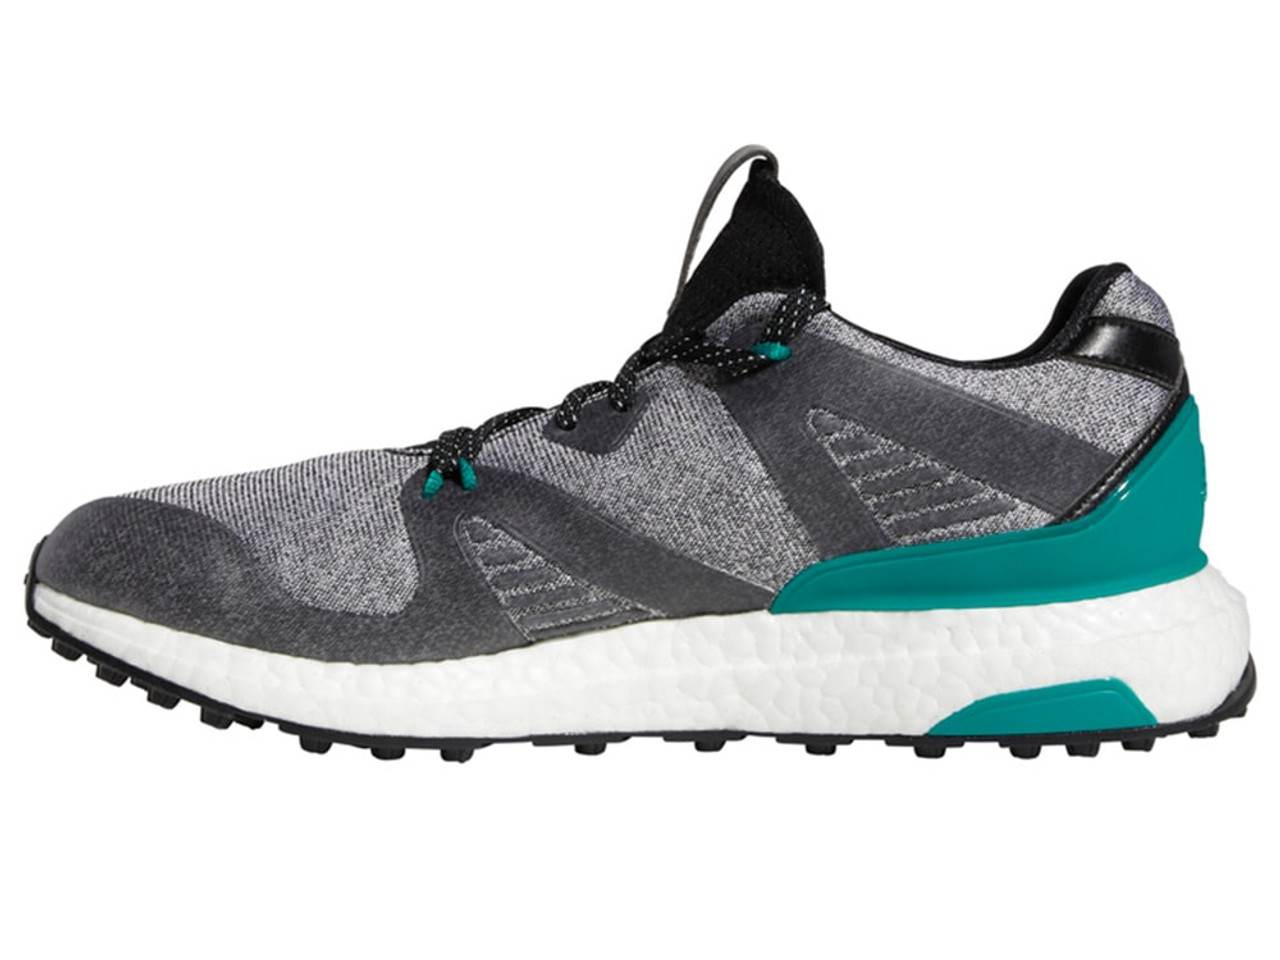 Adidas Crossknit 3.0 Golf Shoes - Core